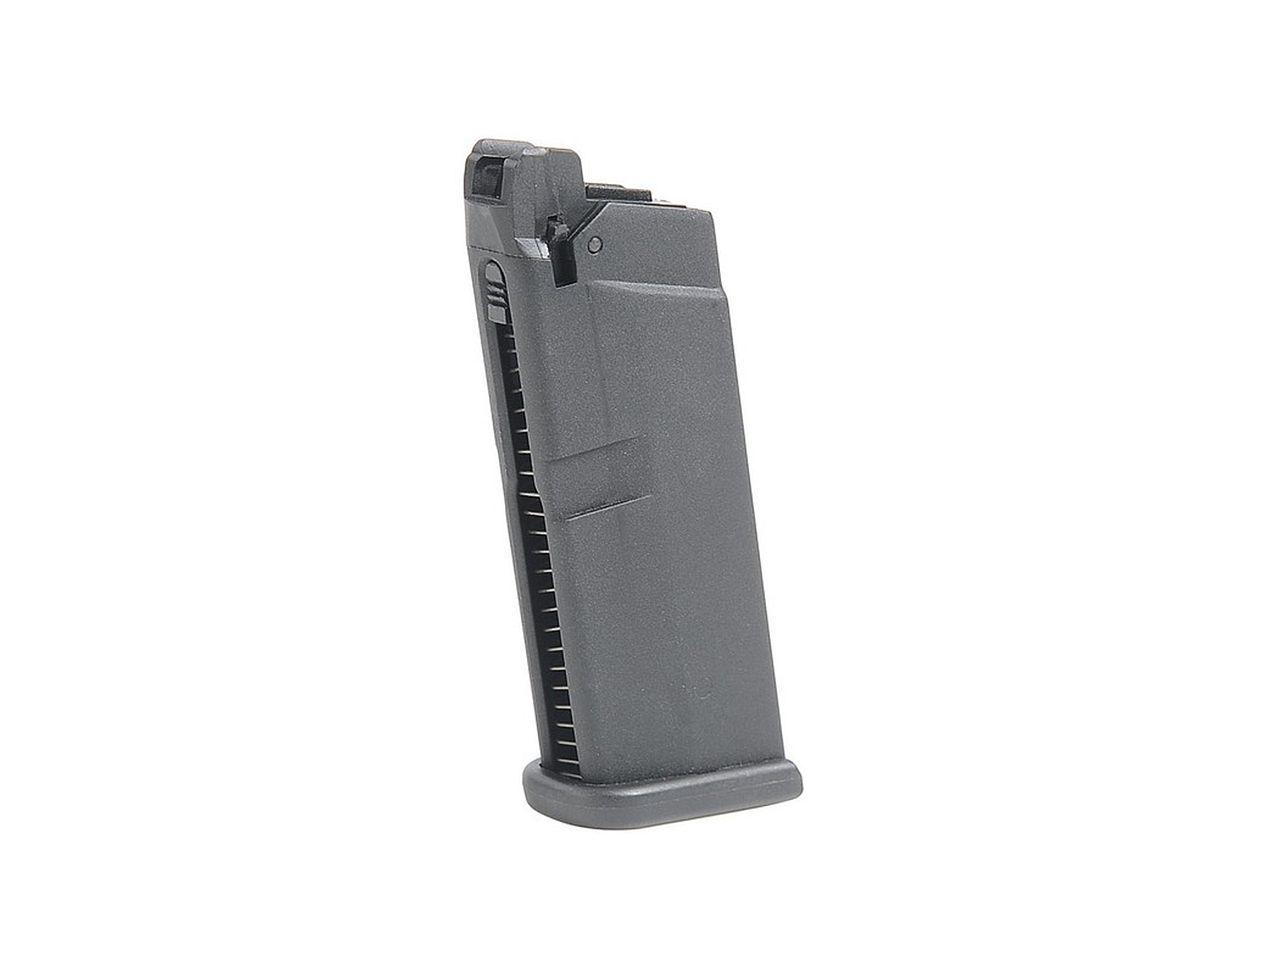 Umarex GlockAirsoft G42 Gen.4 スペアマガジン [2.6410.1-UXA]